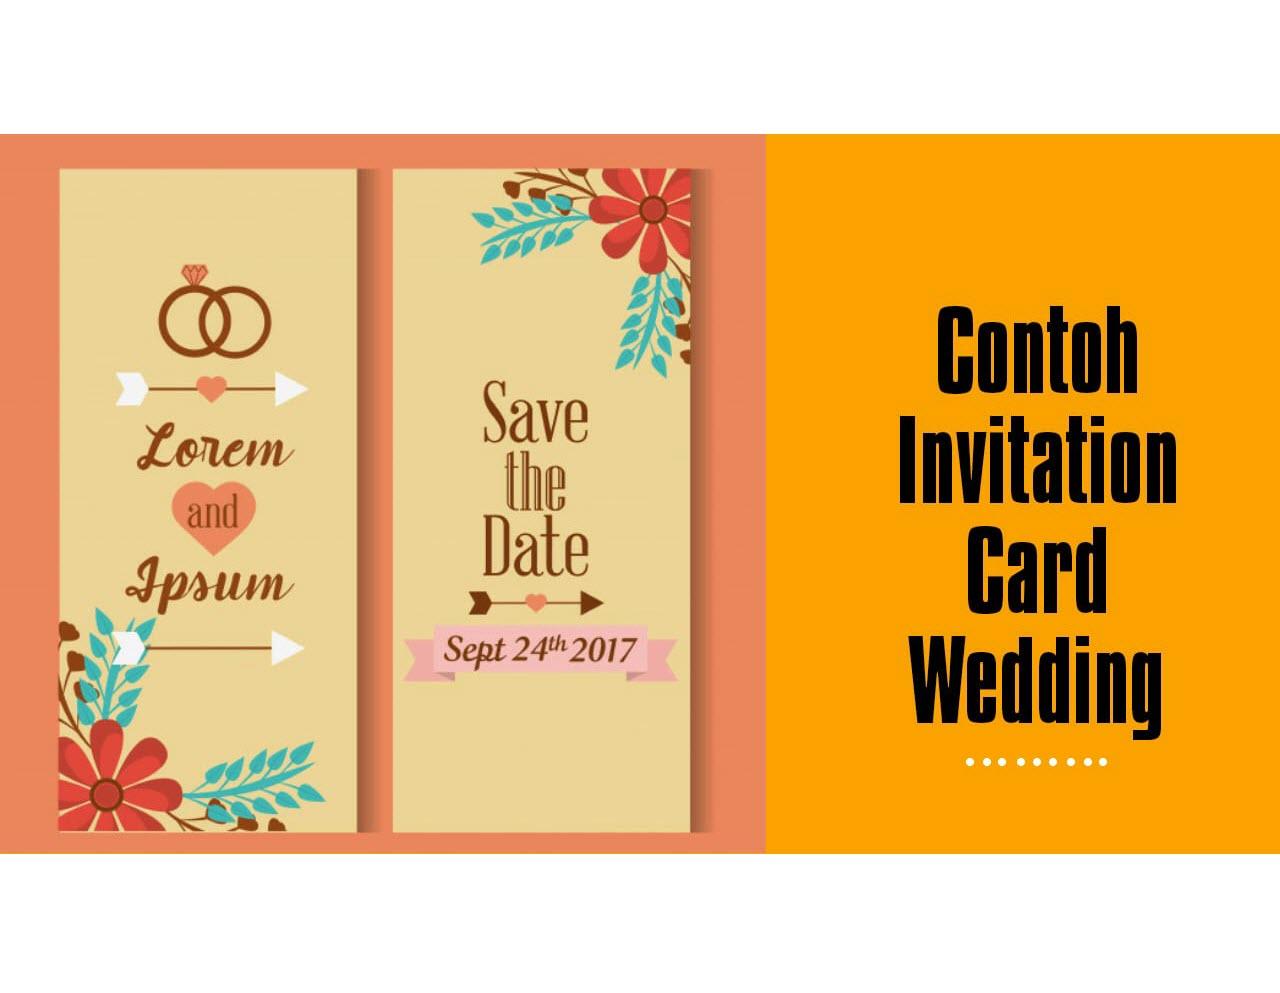 Contoh Wedding Invitation Card